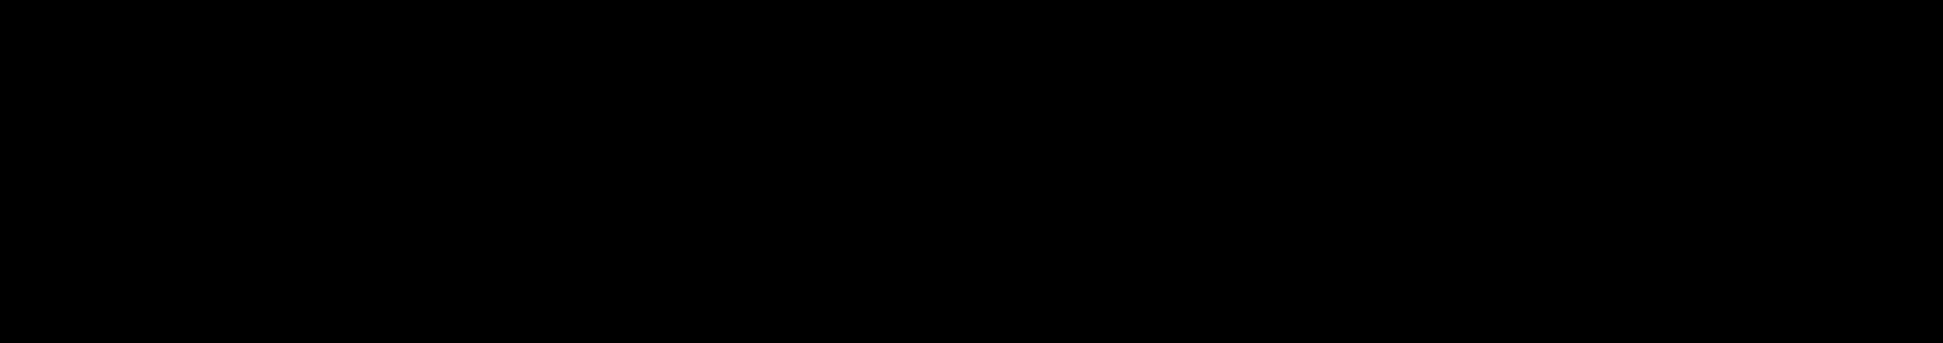 hdmi logo 5 - HDMI Logo